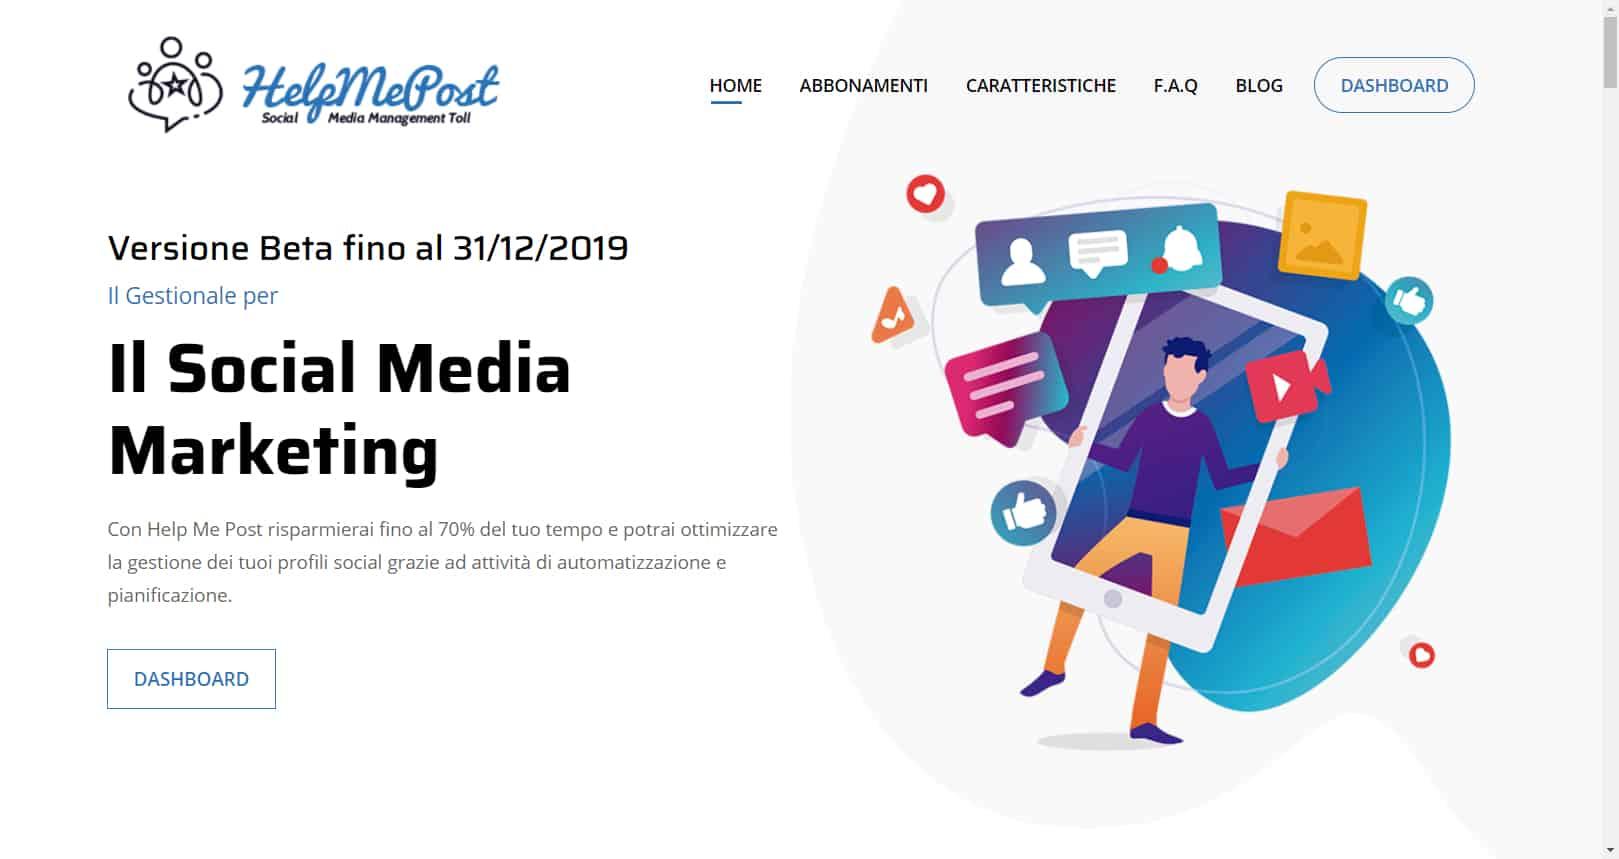 Gianluca Gentile Help me post Social Media Management Cloud Tool 14 10 Giugno 2019